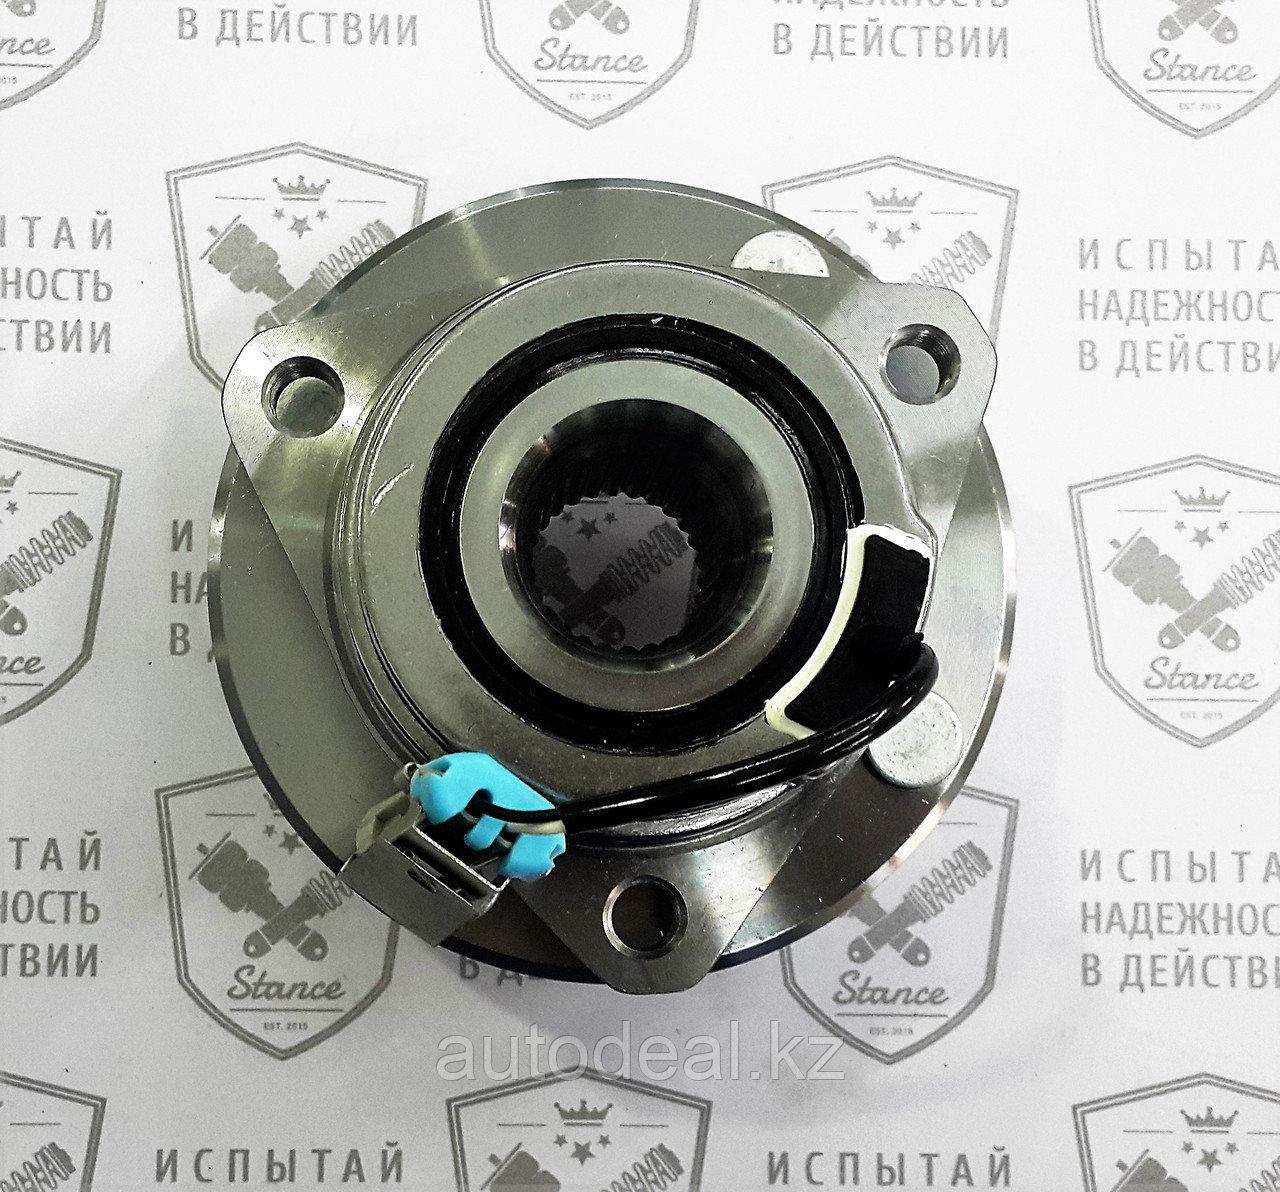 Ступица задняя Geely EC7 / Rear wheel hub